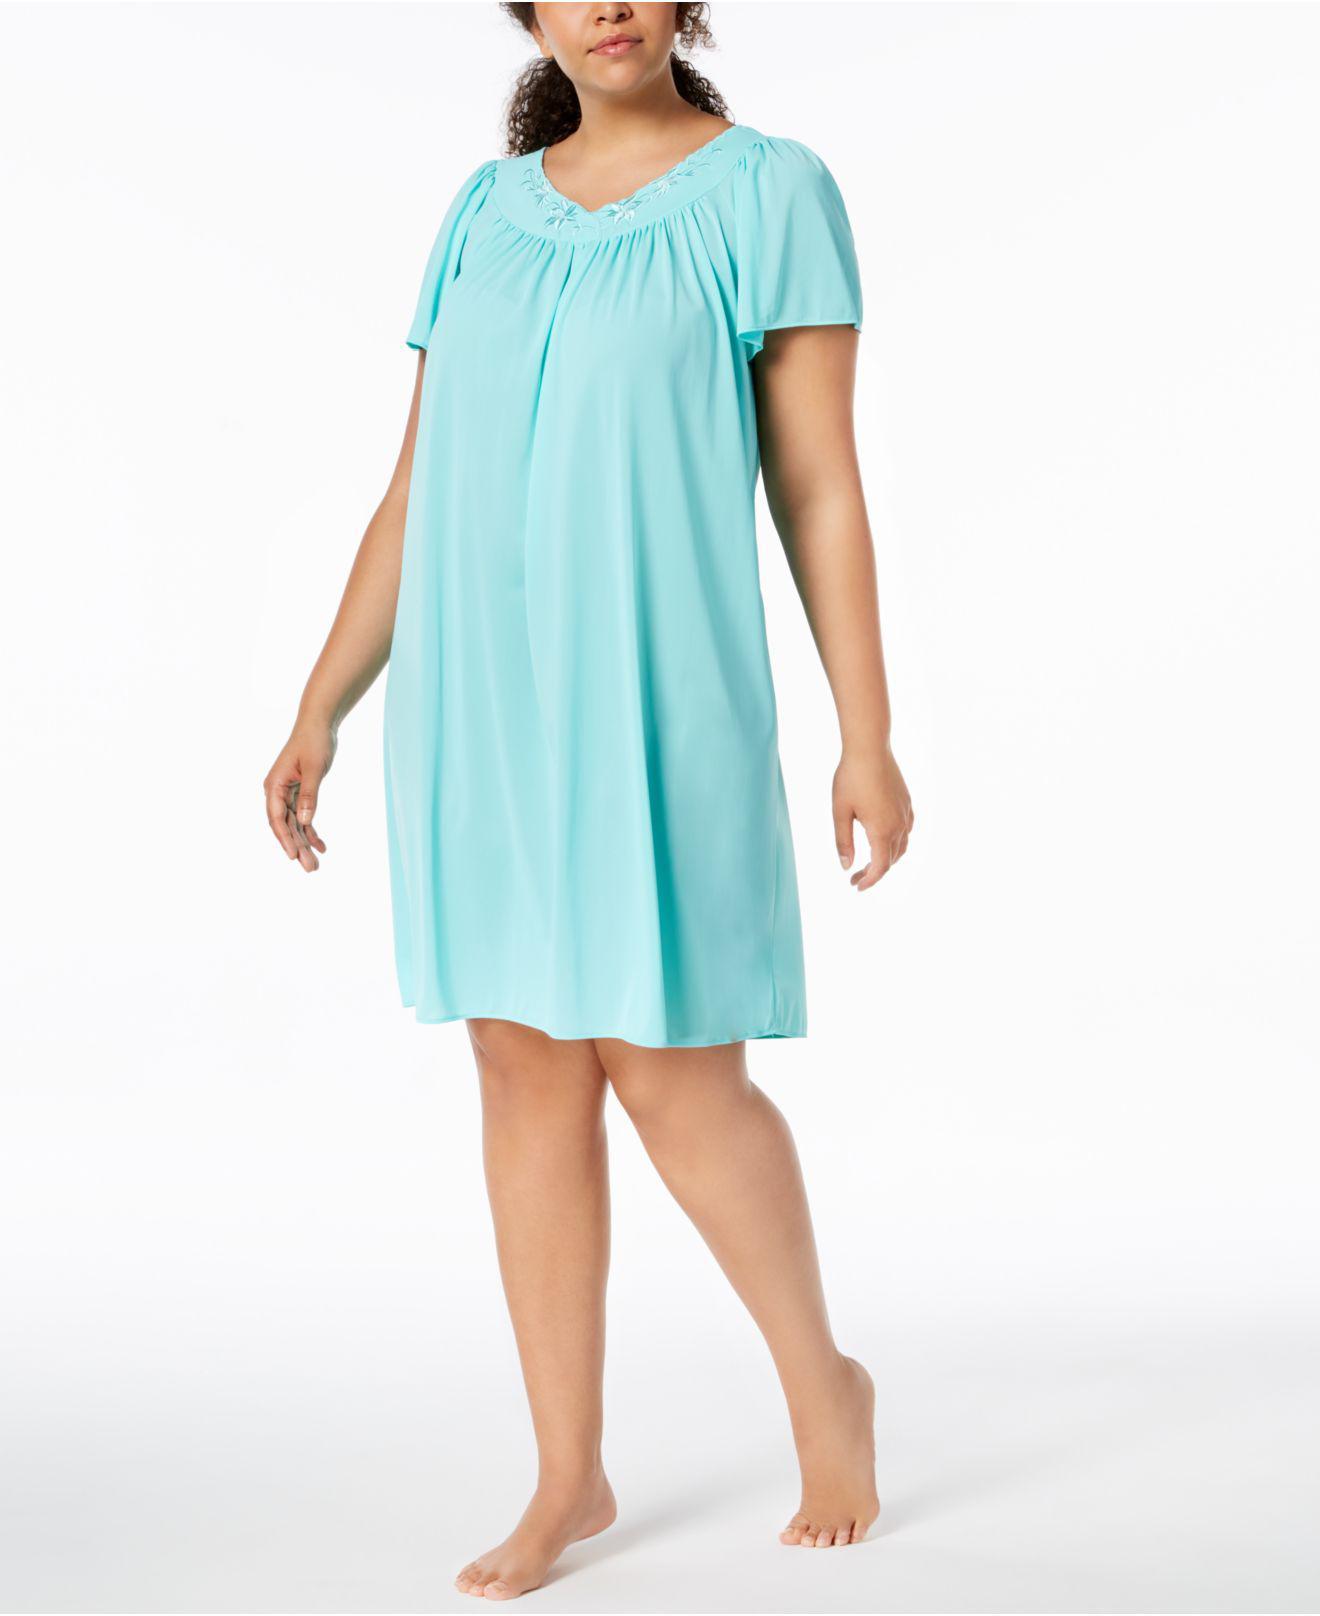 Lyst - Miss Elaine Plus Size Tricot Flutter Sleeve Short Gown in Blue d1e6774c9